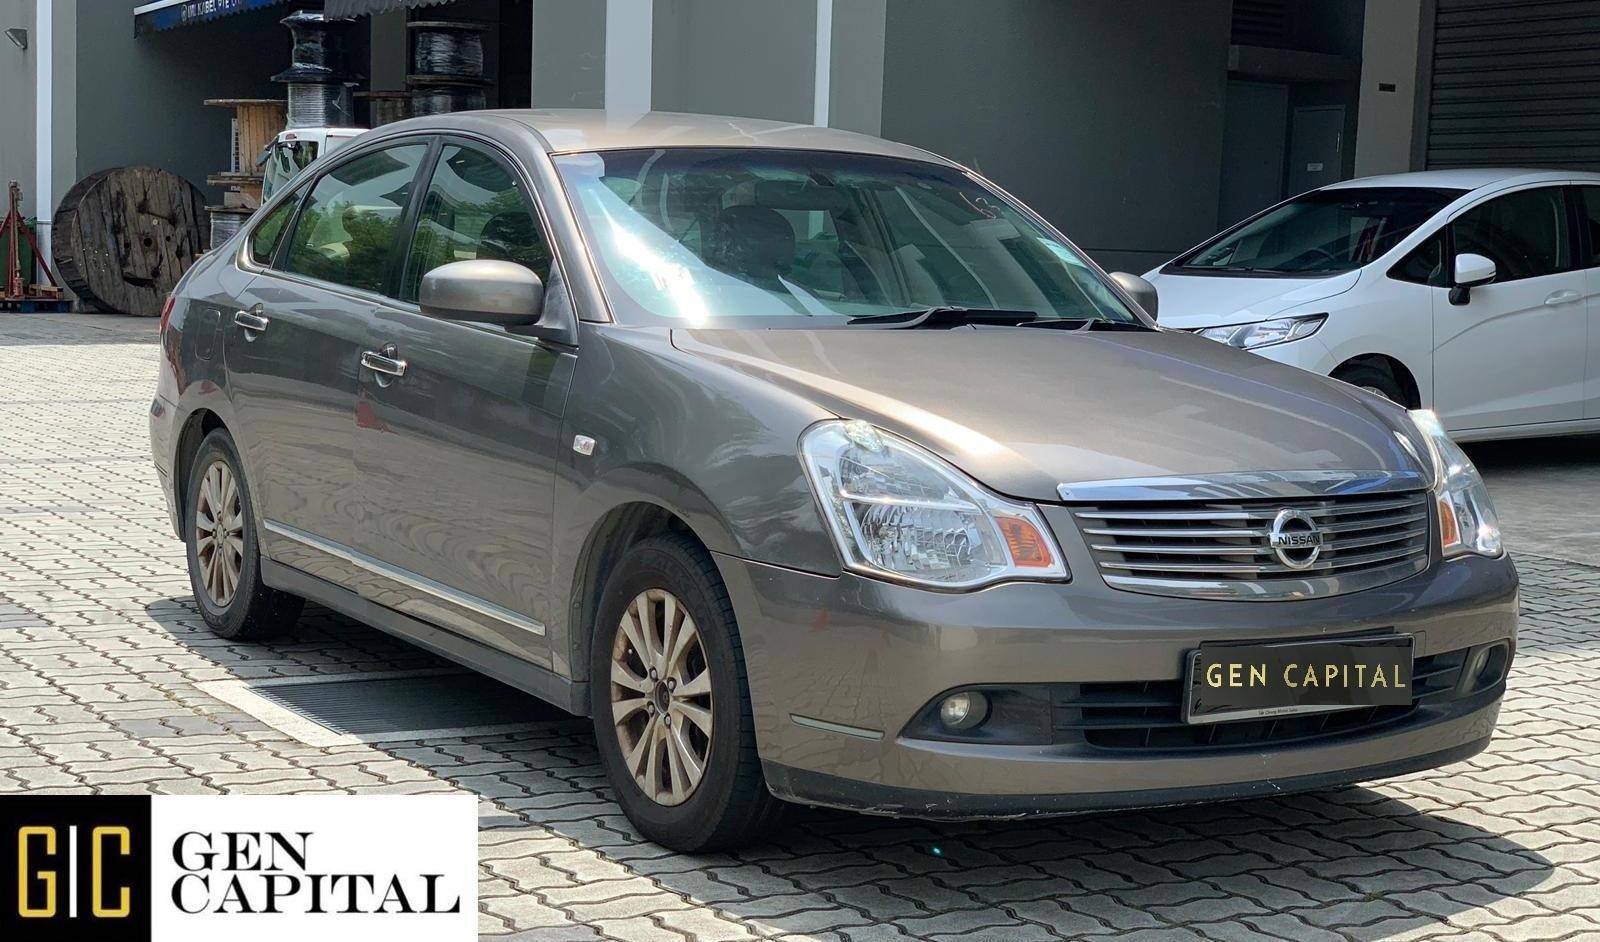 Nissan Sylphy 1.5A Short Term or Long Term Rental Car Service